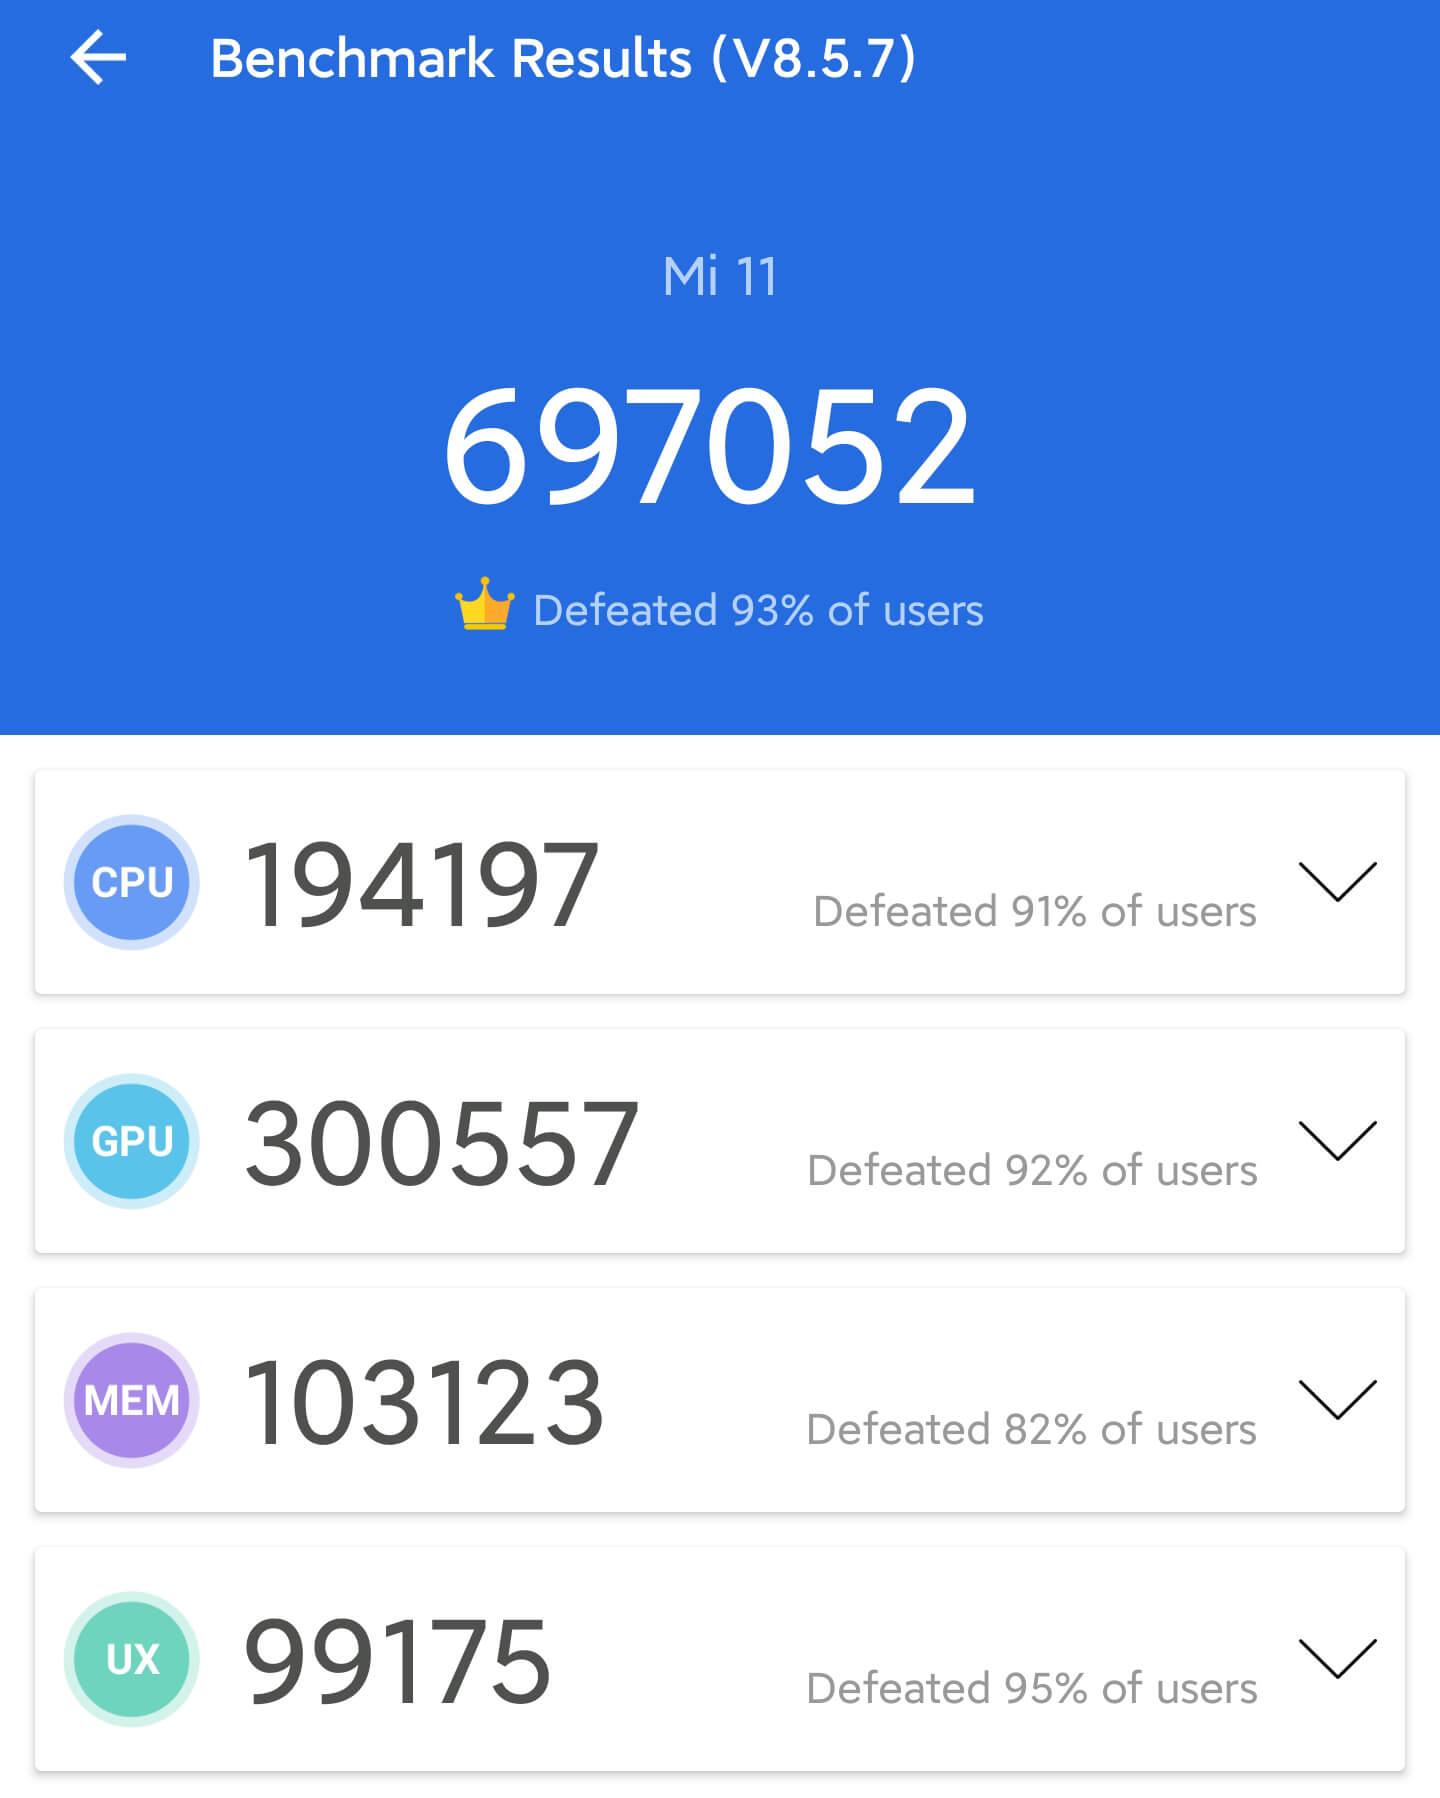 Xiaomi Mi 11のAntutuベンチマークスコア計測1回目は697052